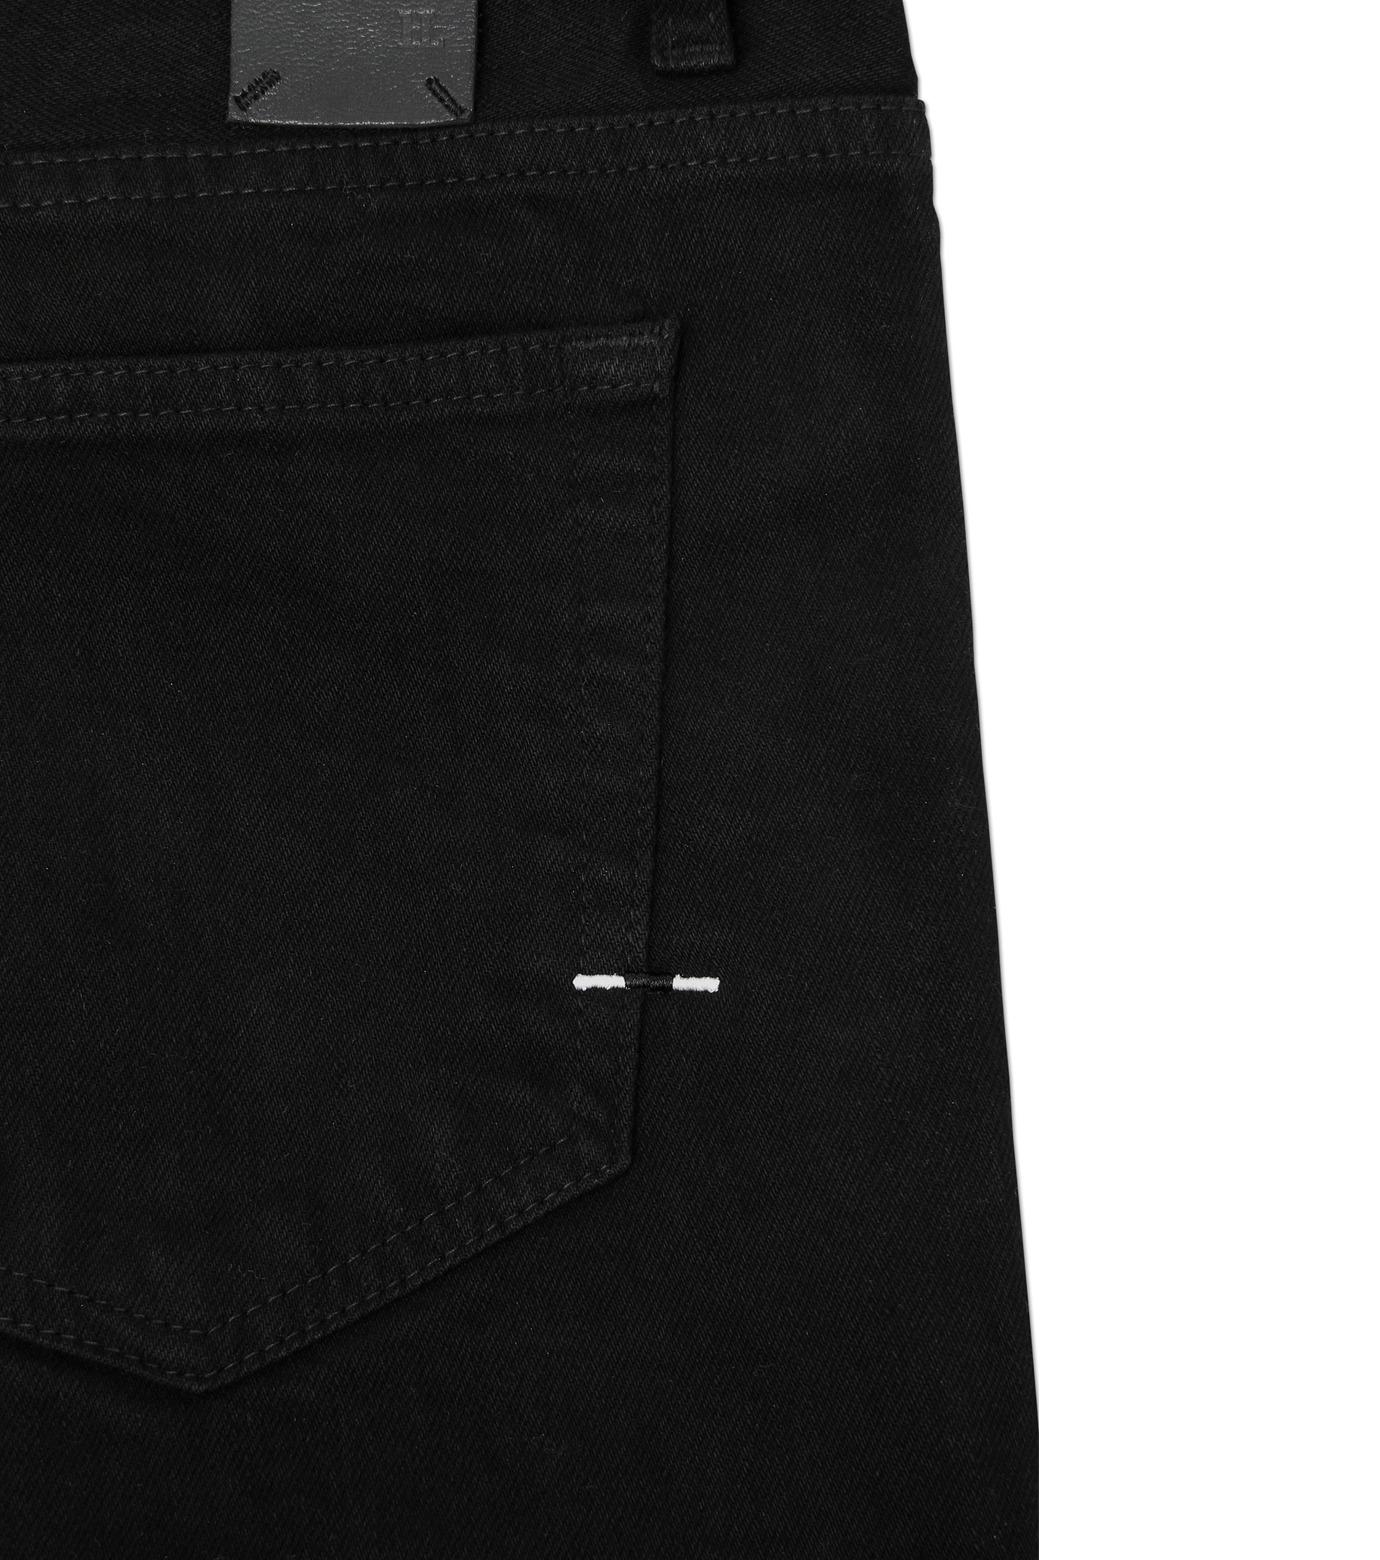 HL HEDDIE LOVU(エイチエル・エディールーヴ)のBLACK DENIM SLIM-BLACK(パンツ/pants)-17A98007-13 拡大詳細画像6